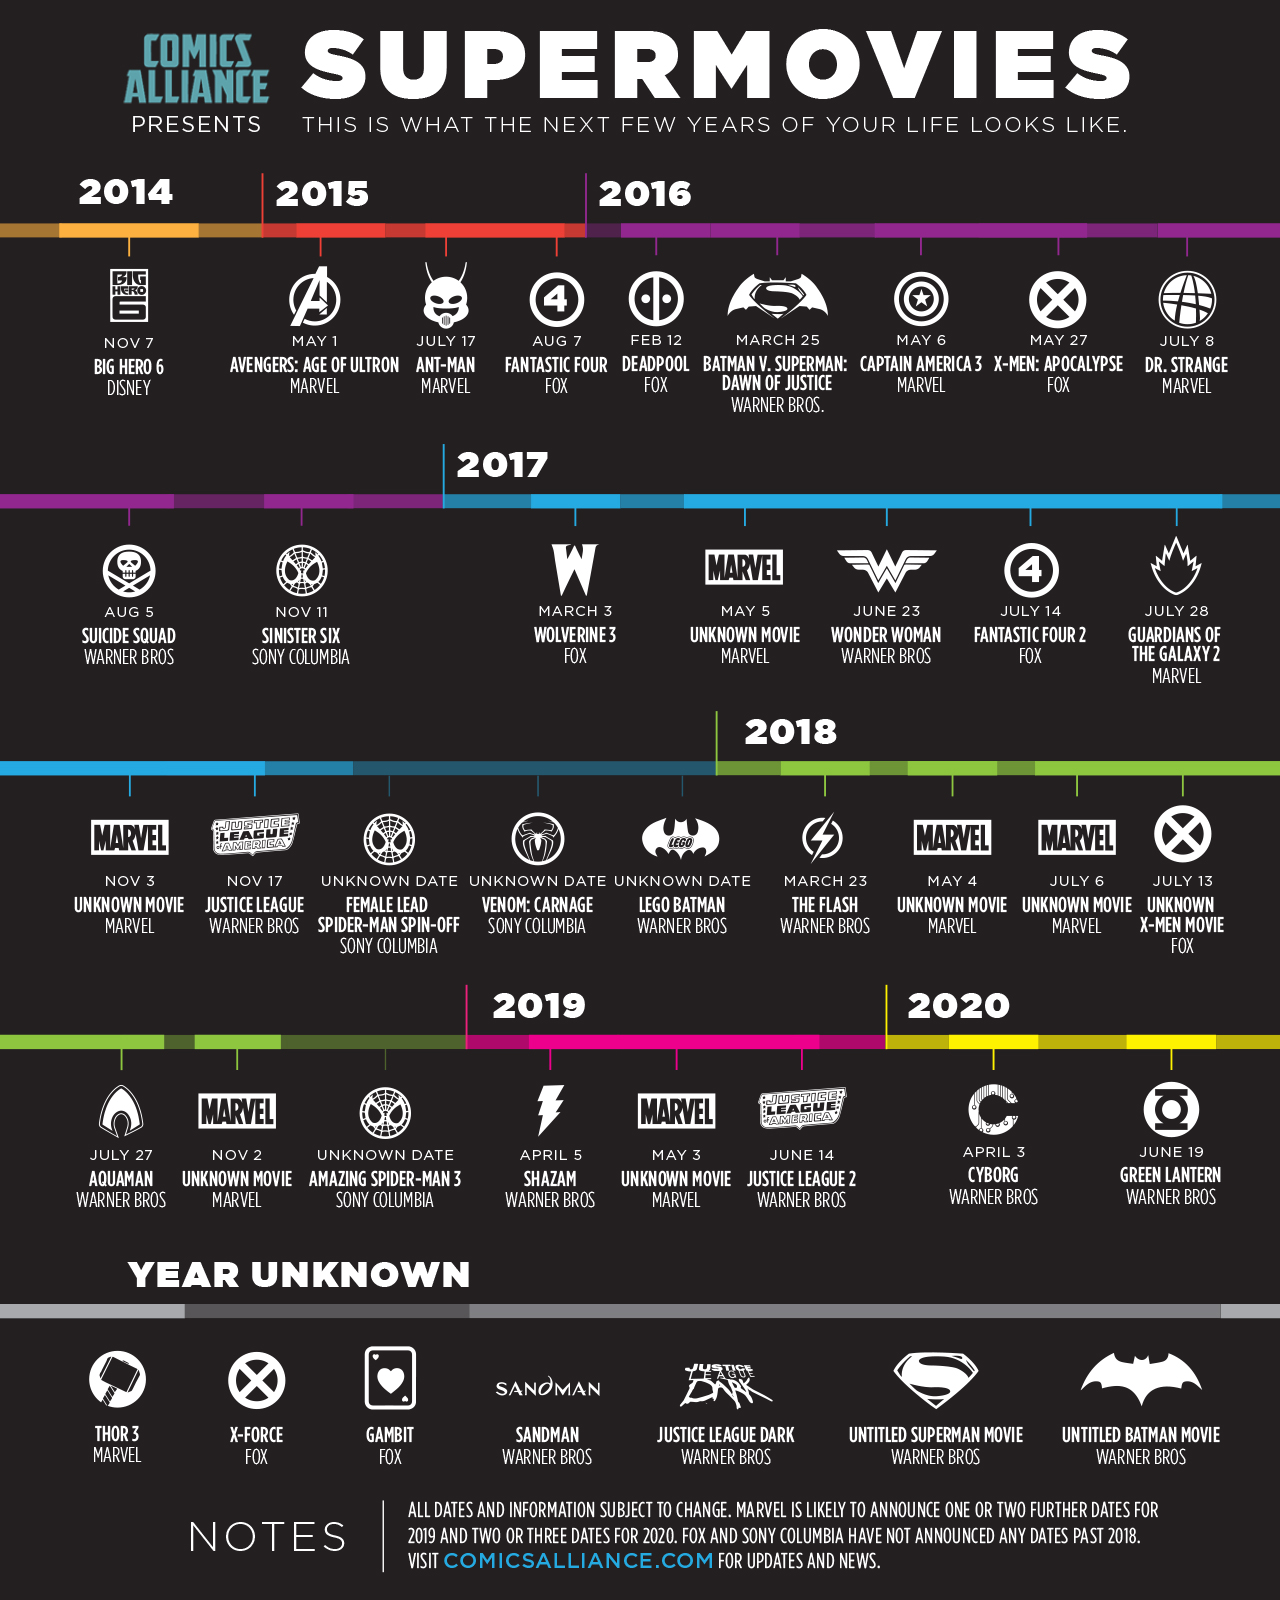 Comic book movie graphic